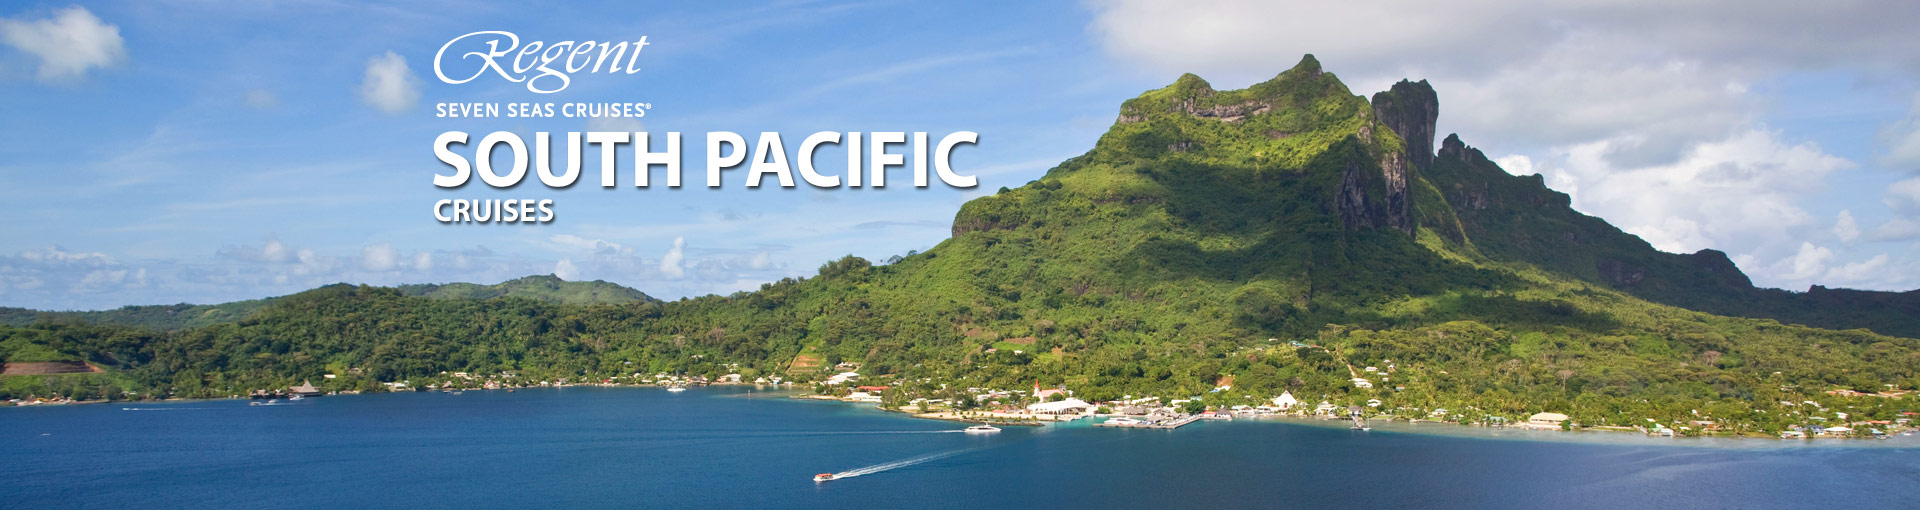 Regent Seven Seas Cruises South Pacific / Tahiti C